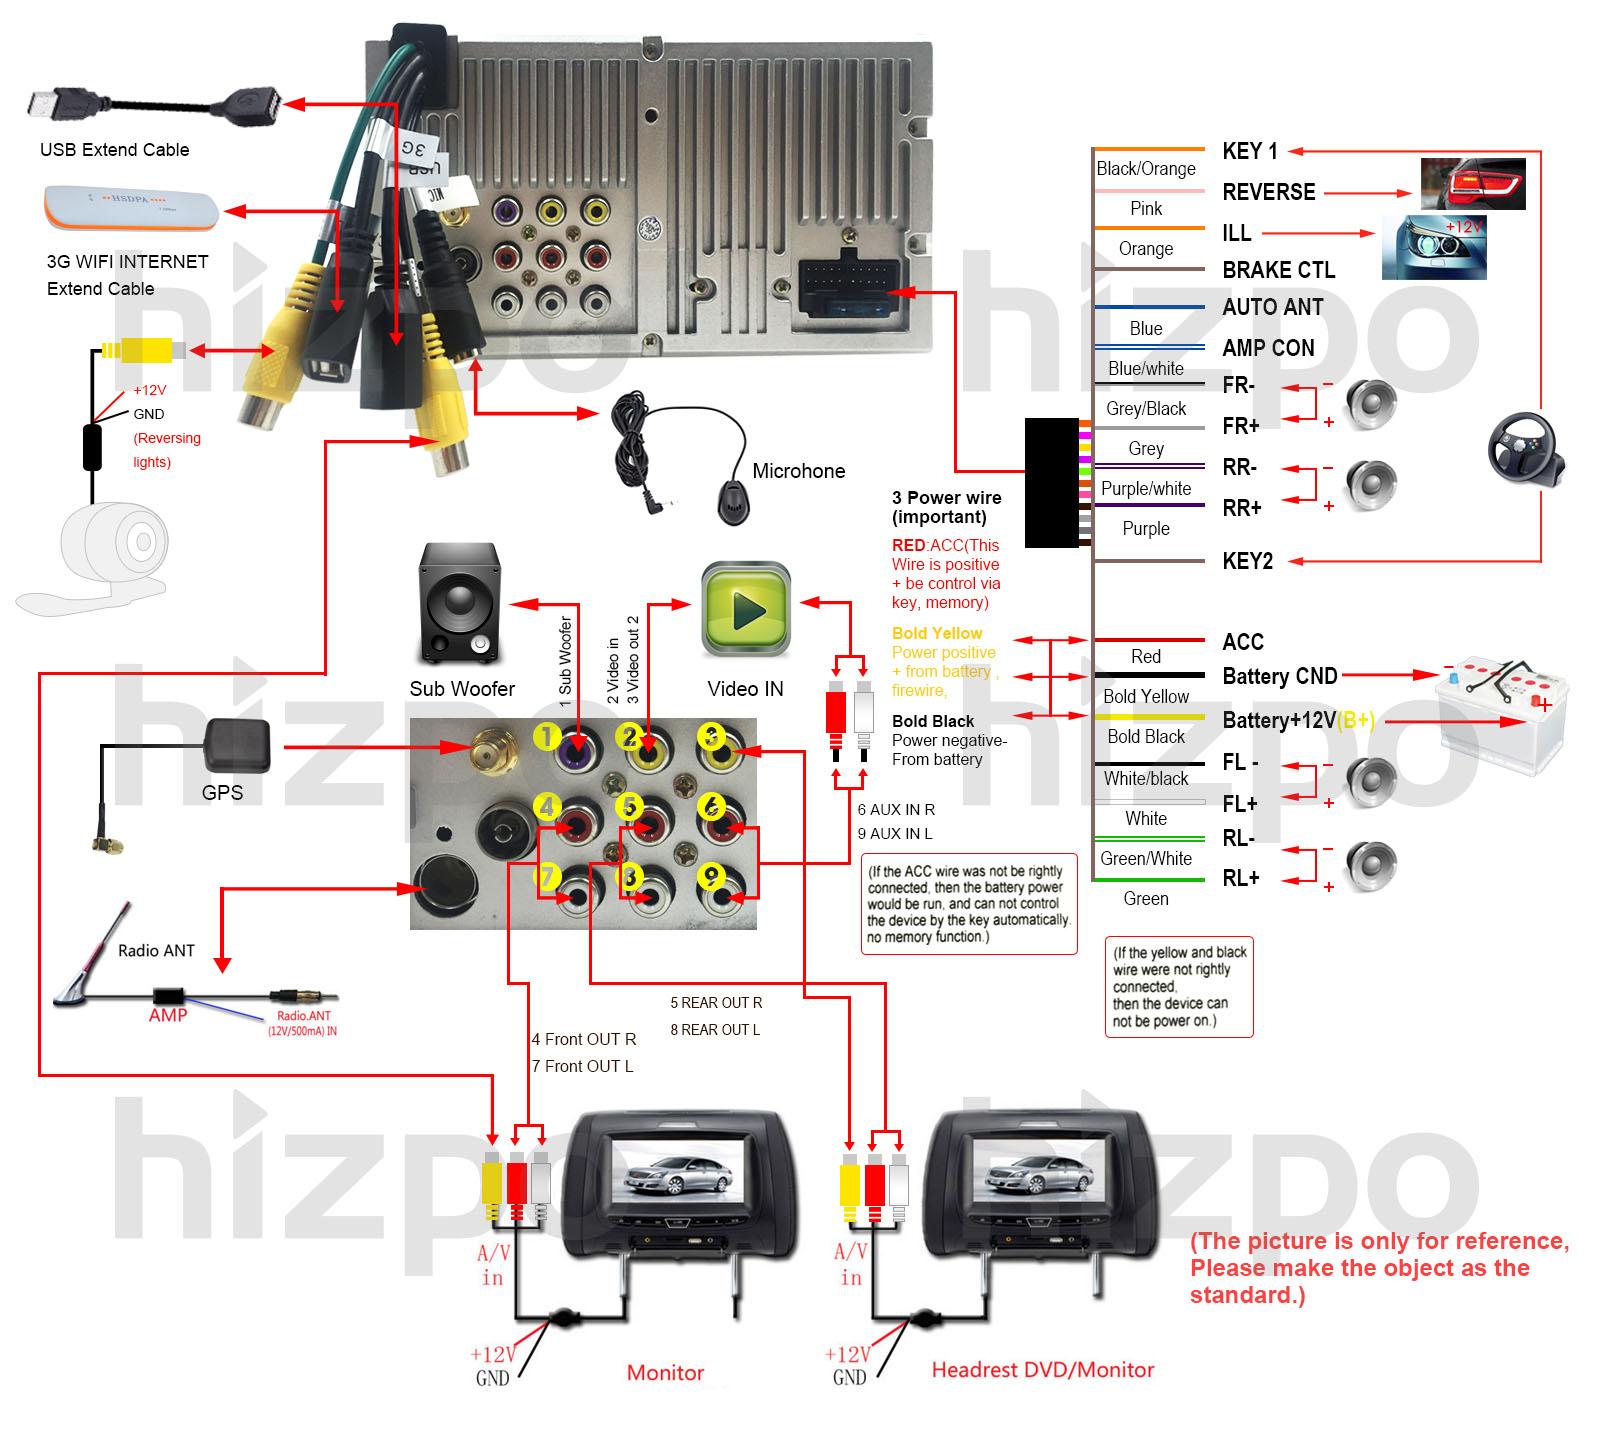 WiringDiagram 1?resize=665%2C599 alpine pkg rse2 wiring diagram wiring diagram images alpine pkg-rse2 wiring diagram at n-0.co